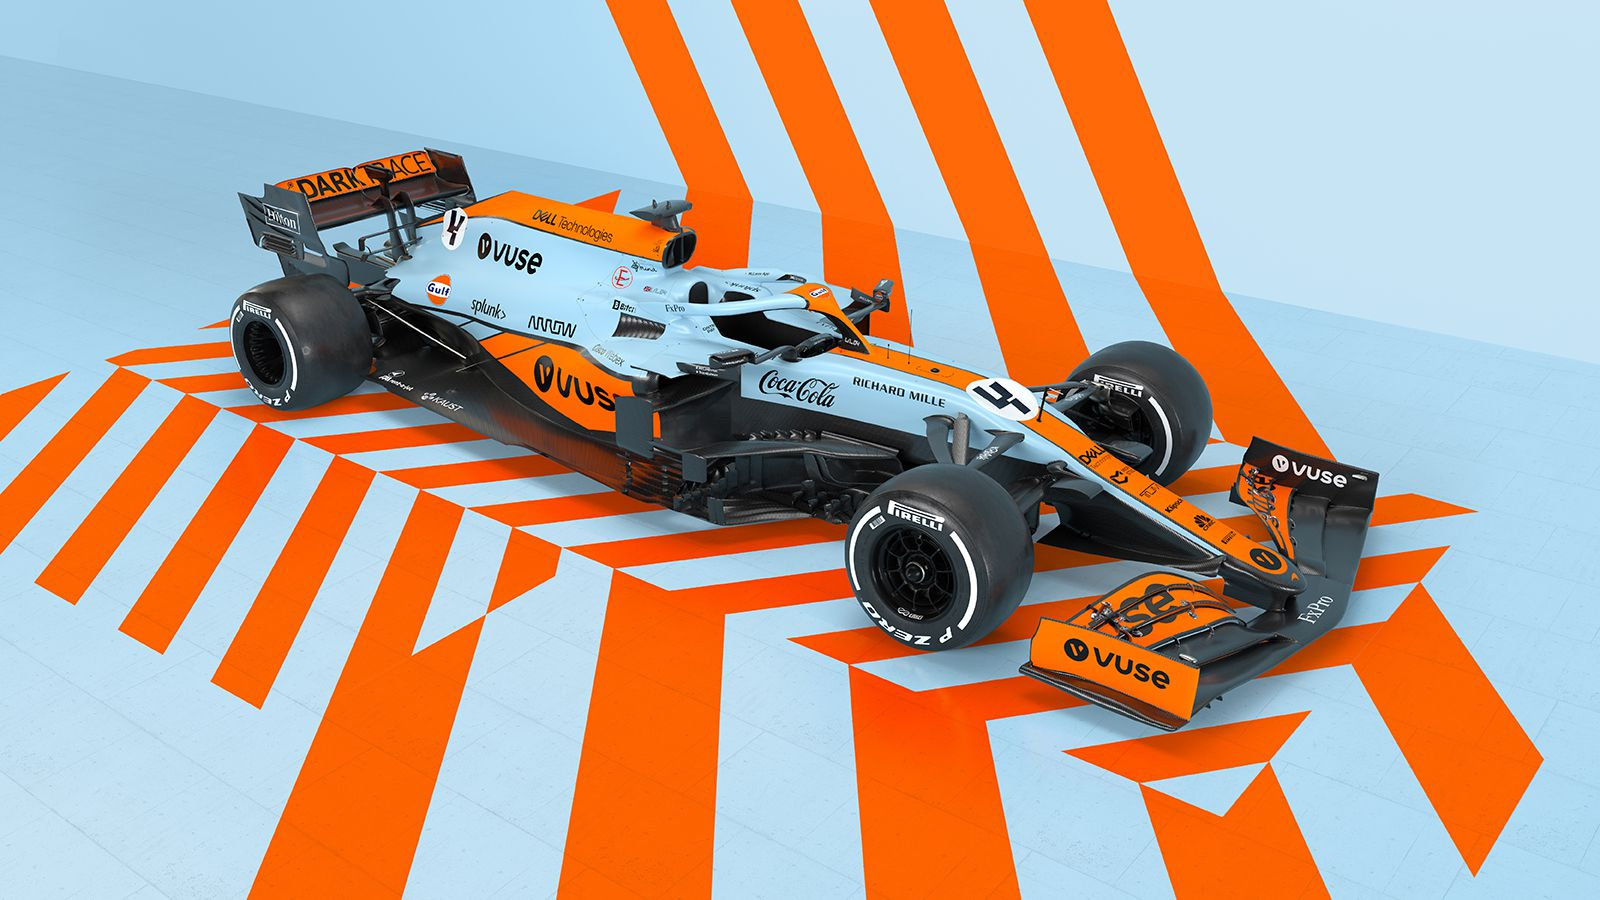 2021 McLaren F1 Car Gulf Livery